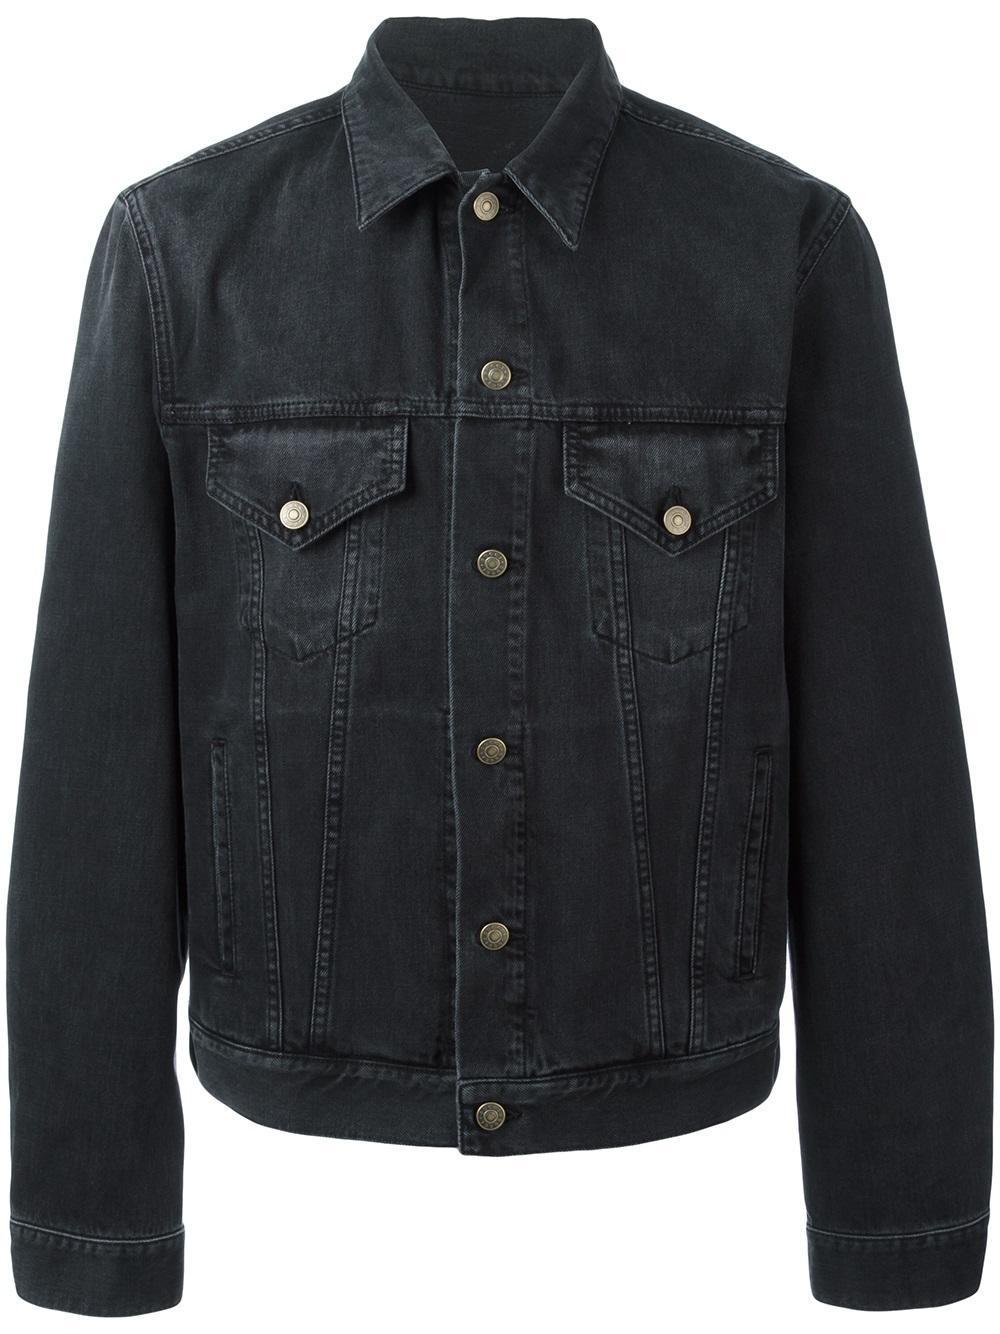 Gucci Embroidered Denim Jacket In Black For Men  Lyst